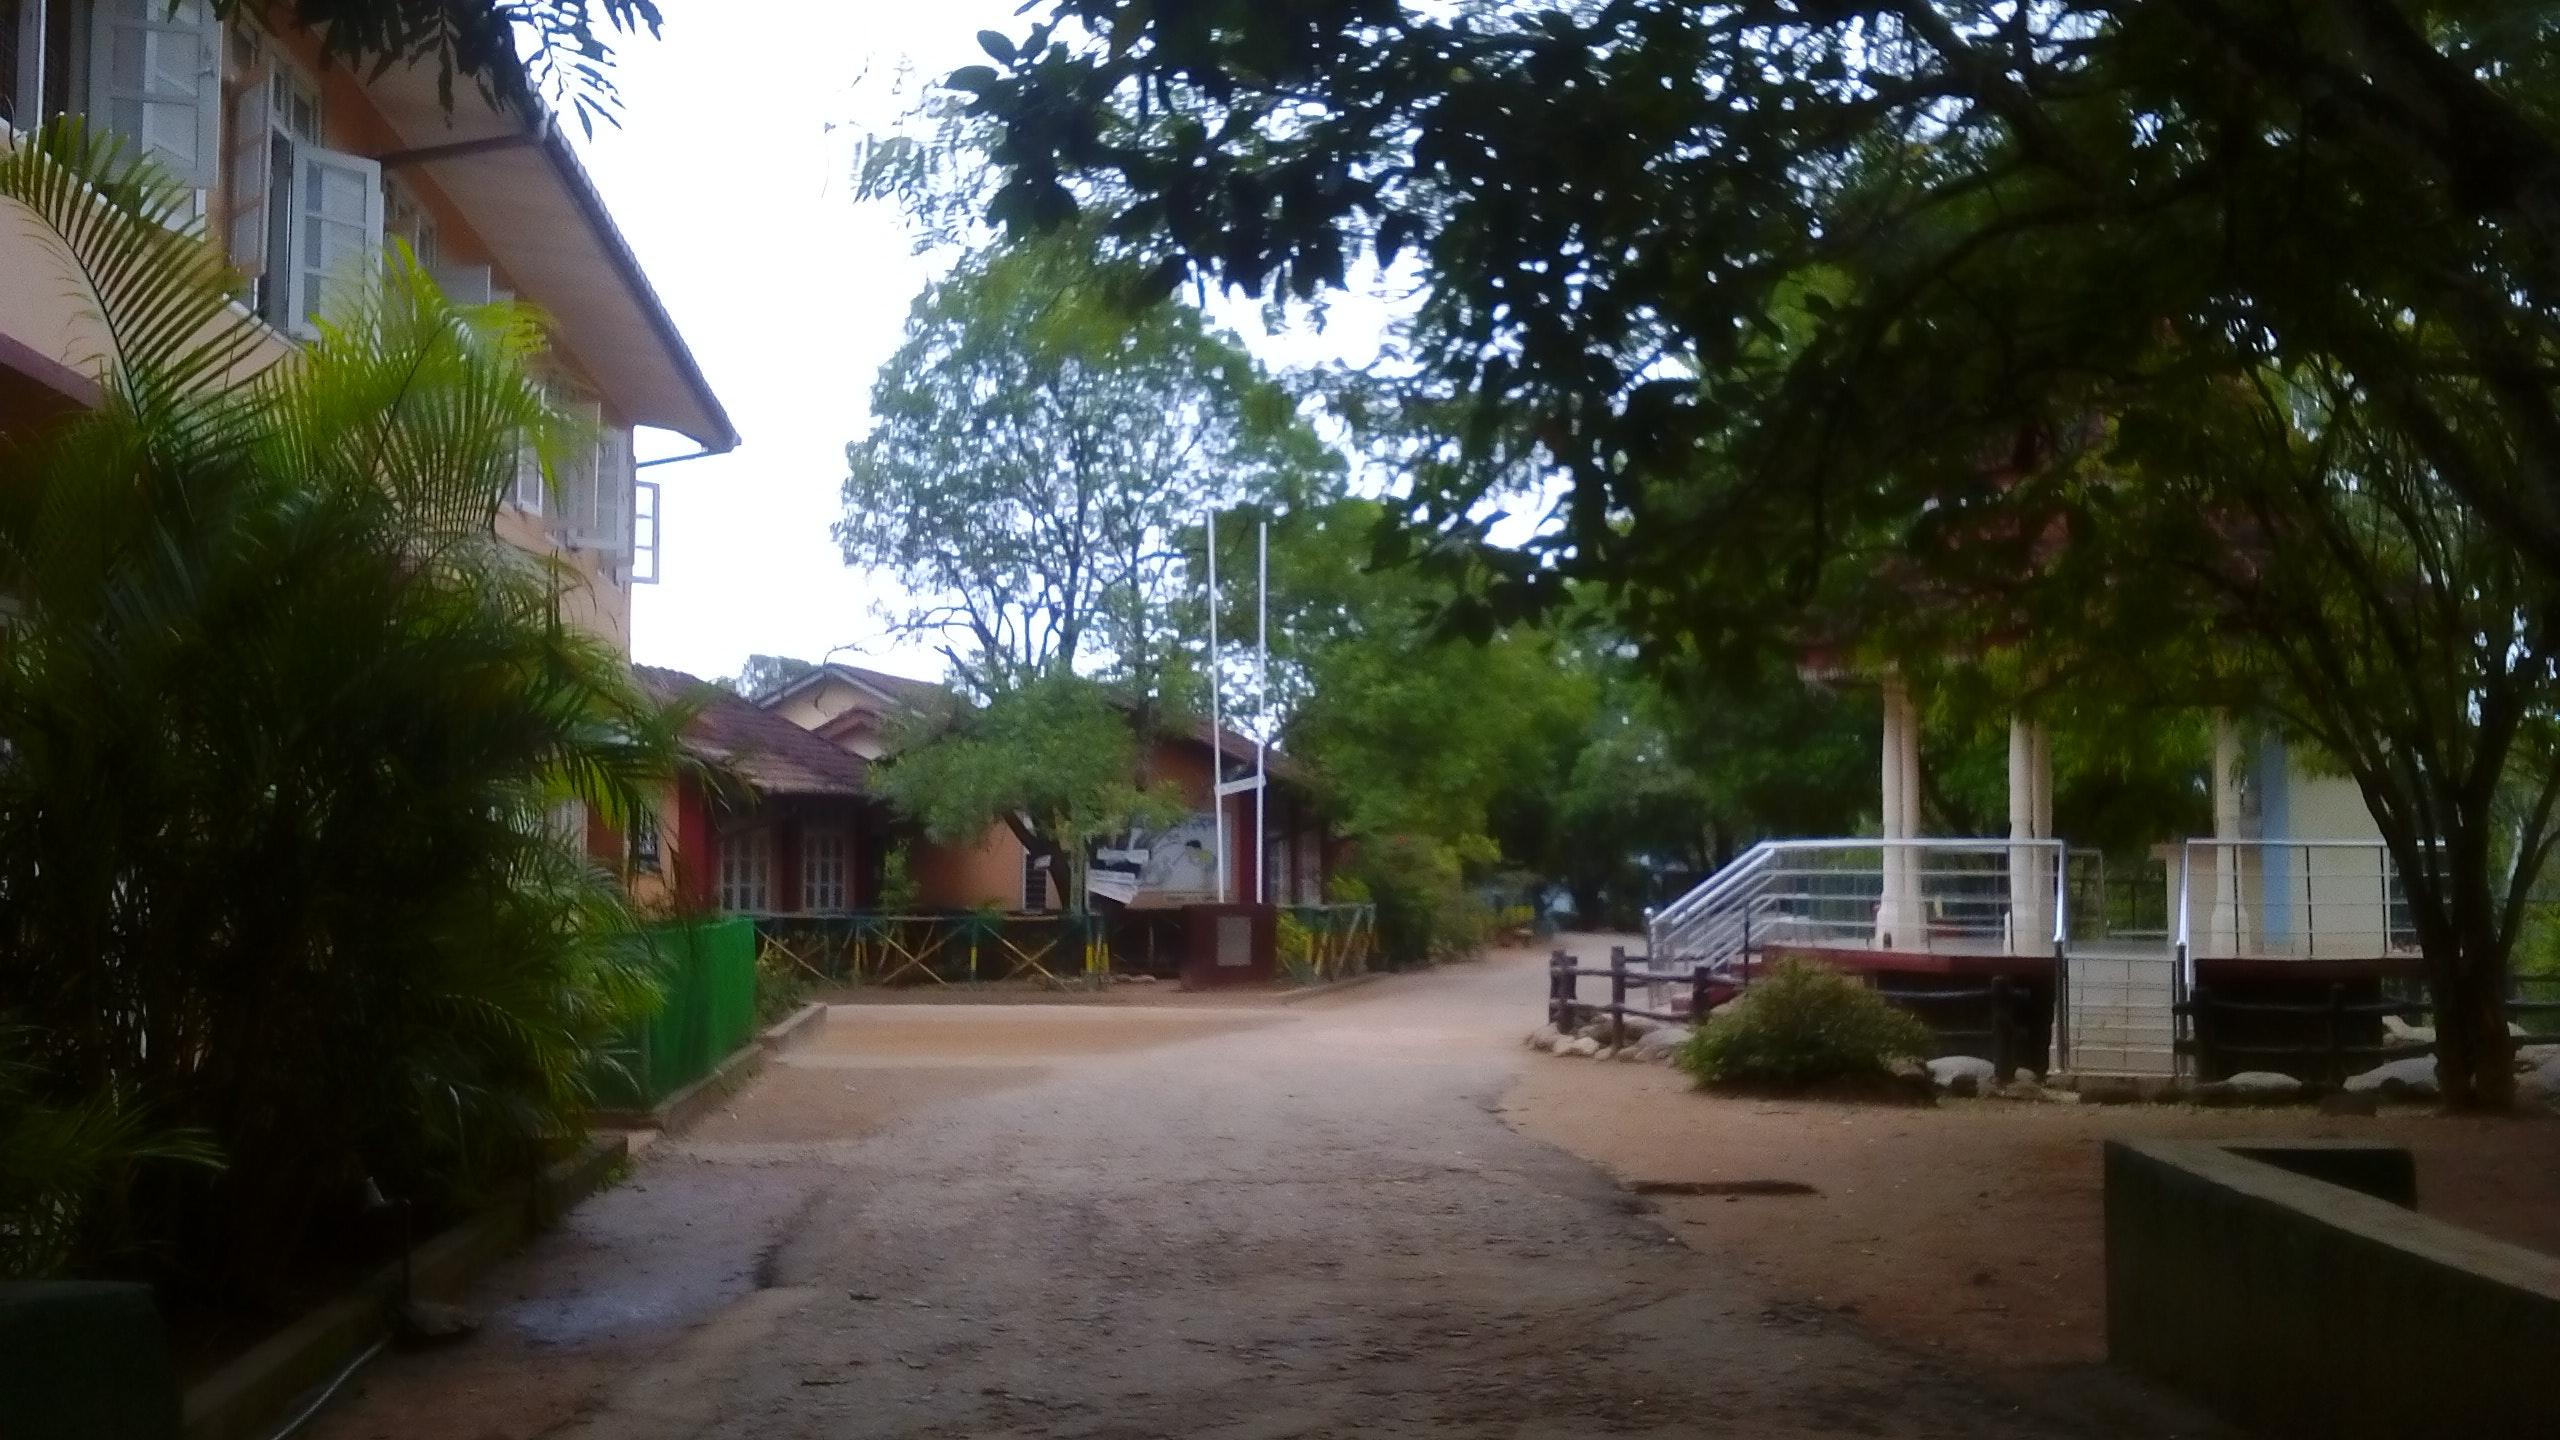 Foto Stok Gratis Tentang Sekolah Dasar Ewadikaram